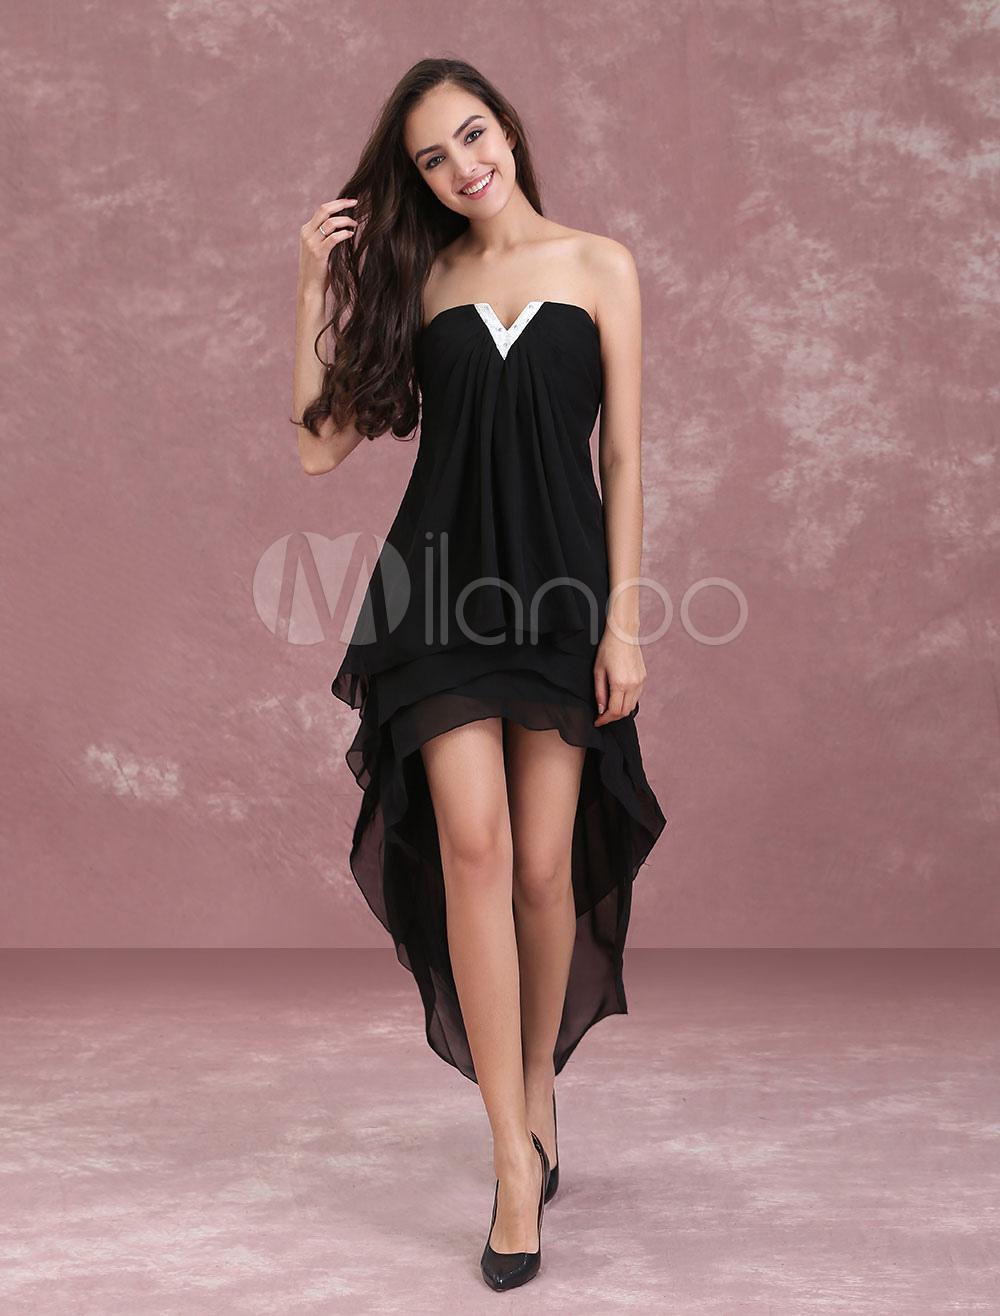 Black Homecoming Dresses Strapless High Low Chiffon Asymmetrical Beaded Women Prom Dress (Wedding) photo